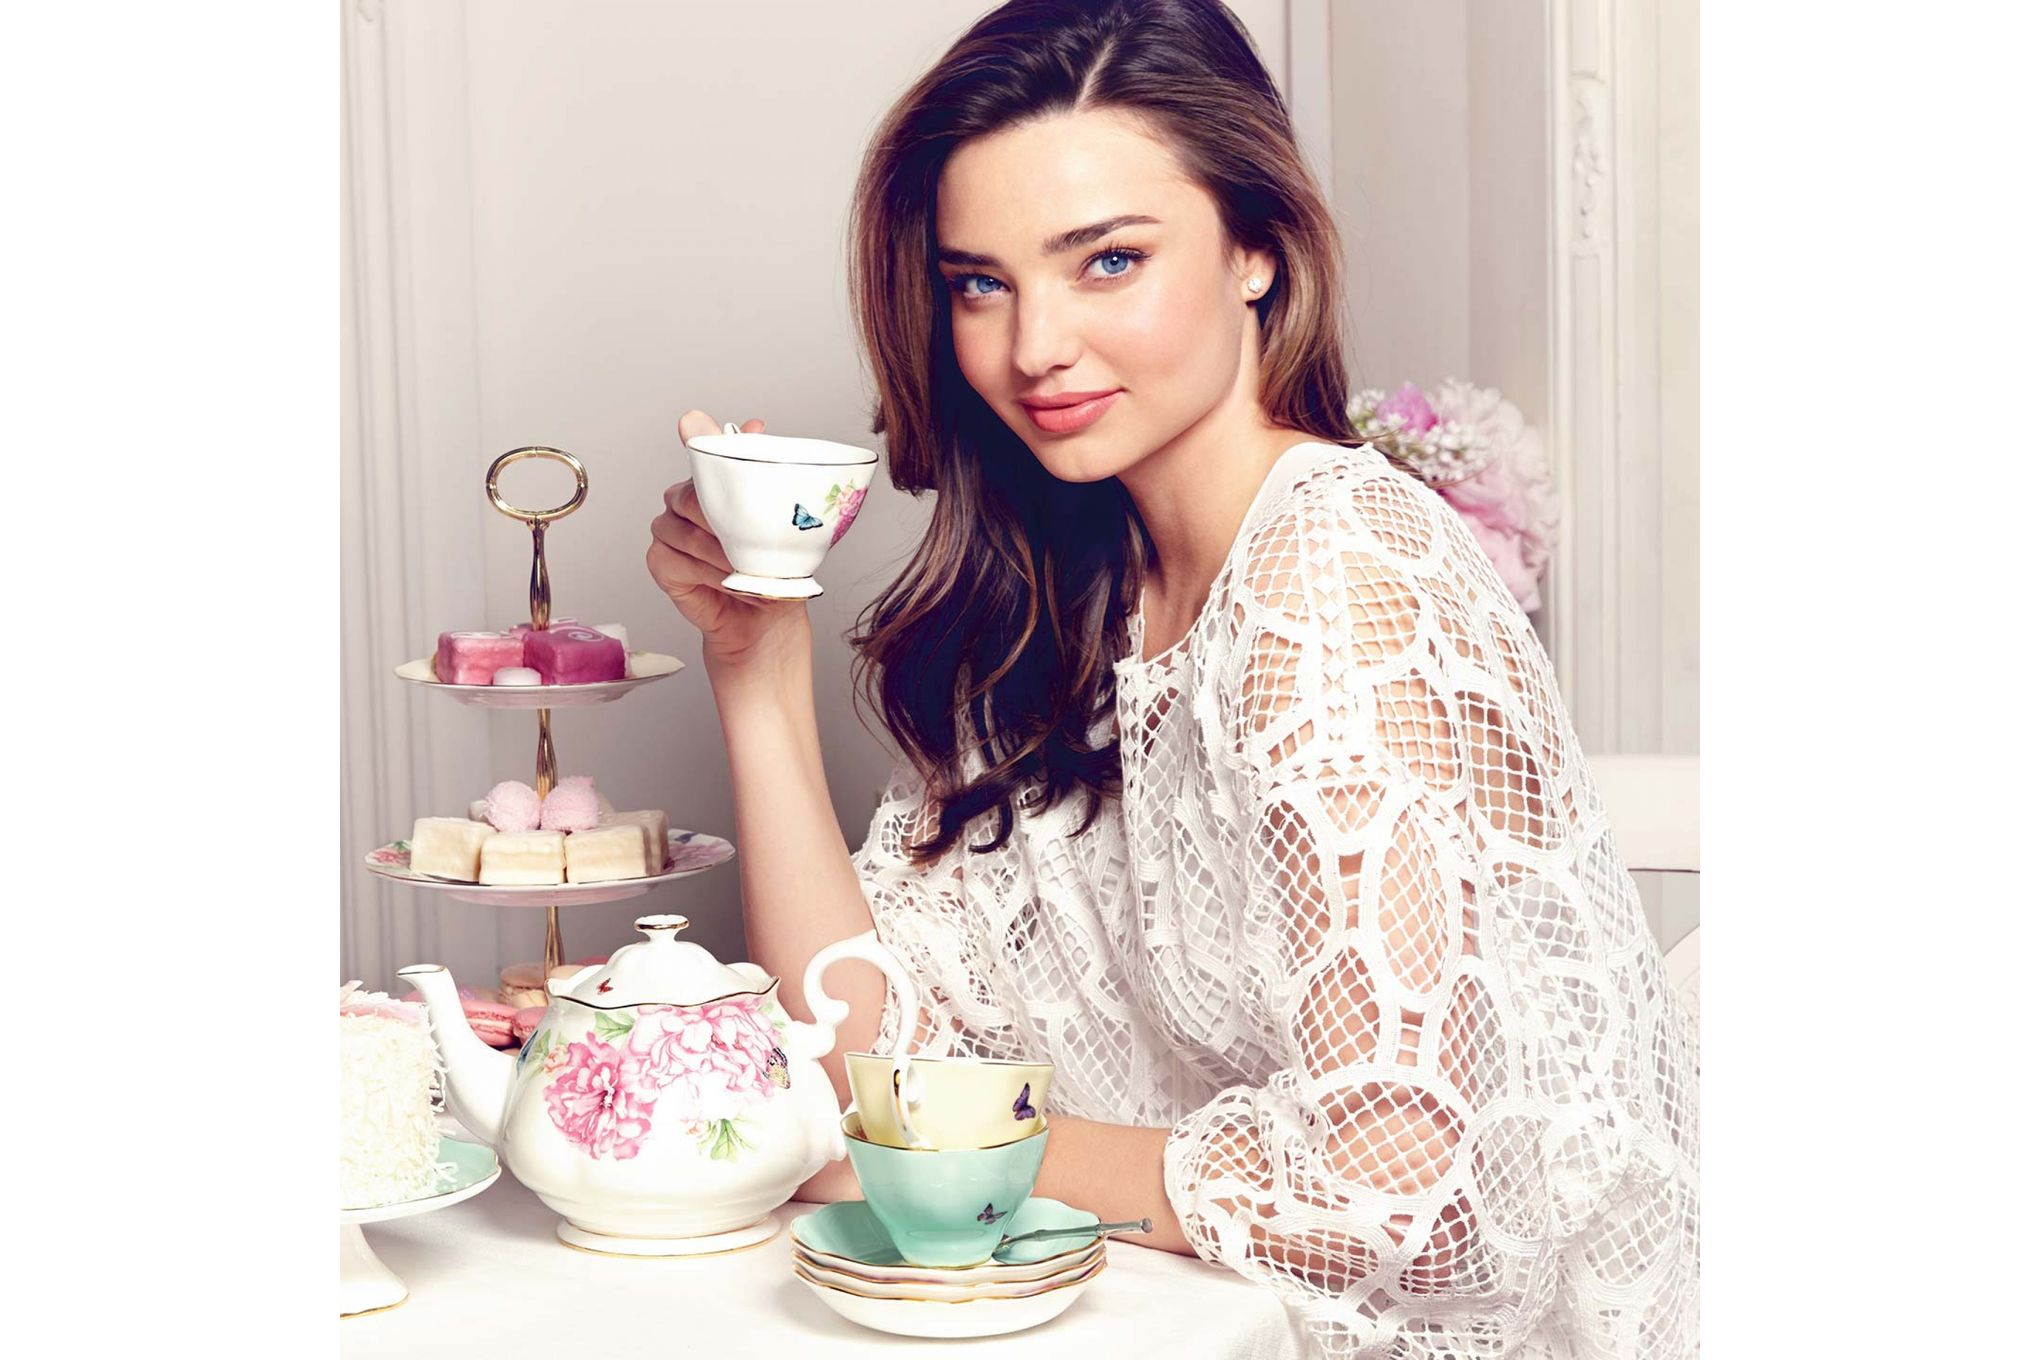 Miranda Kerr for Royal Albert Gift Sets 3 Tier Cake Stand thumb 3